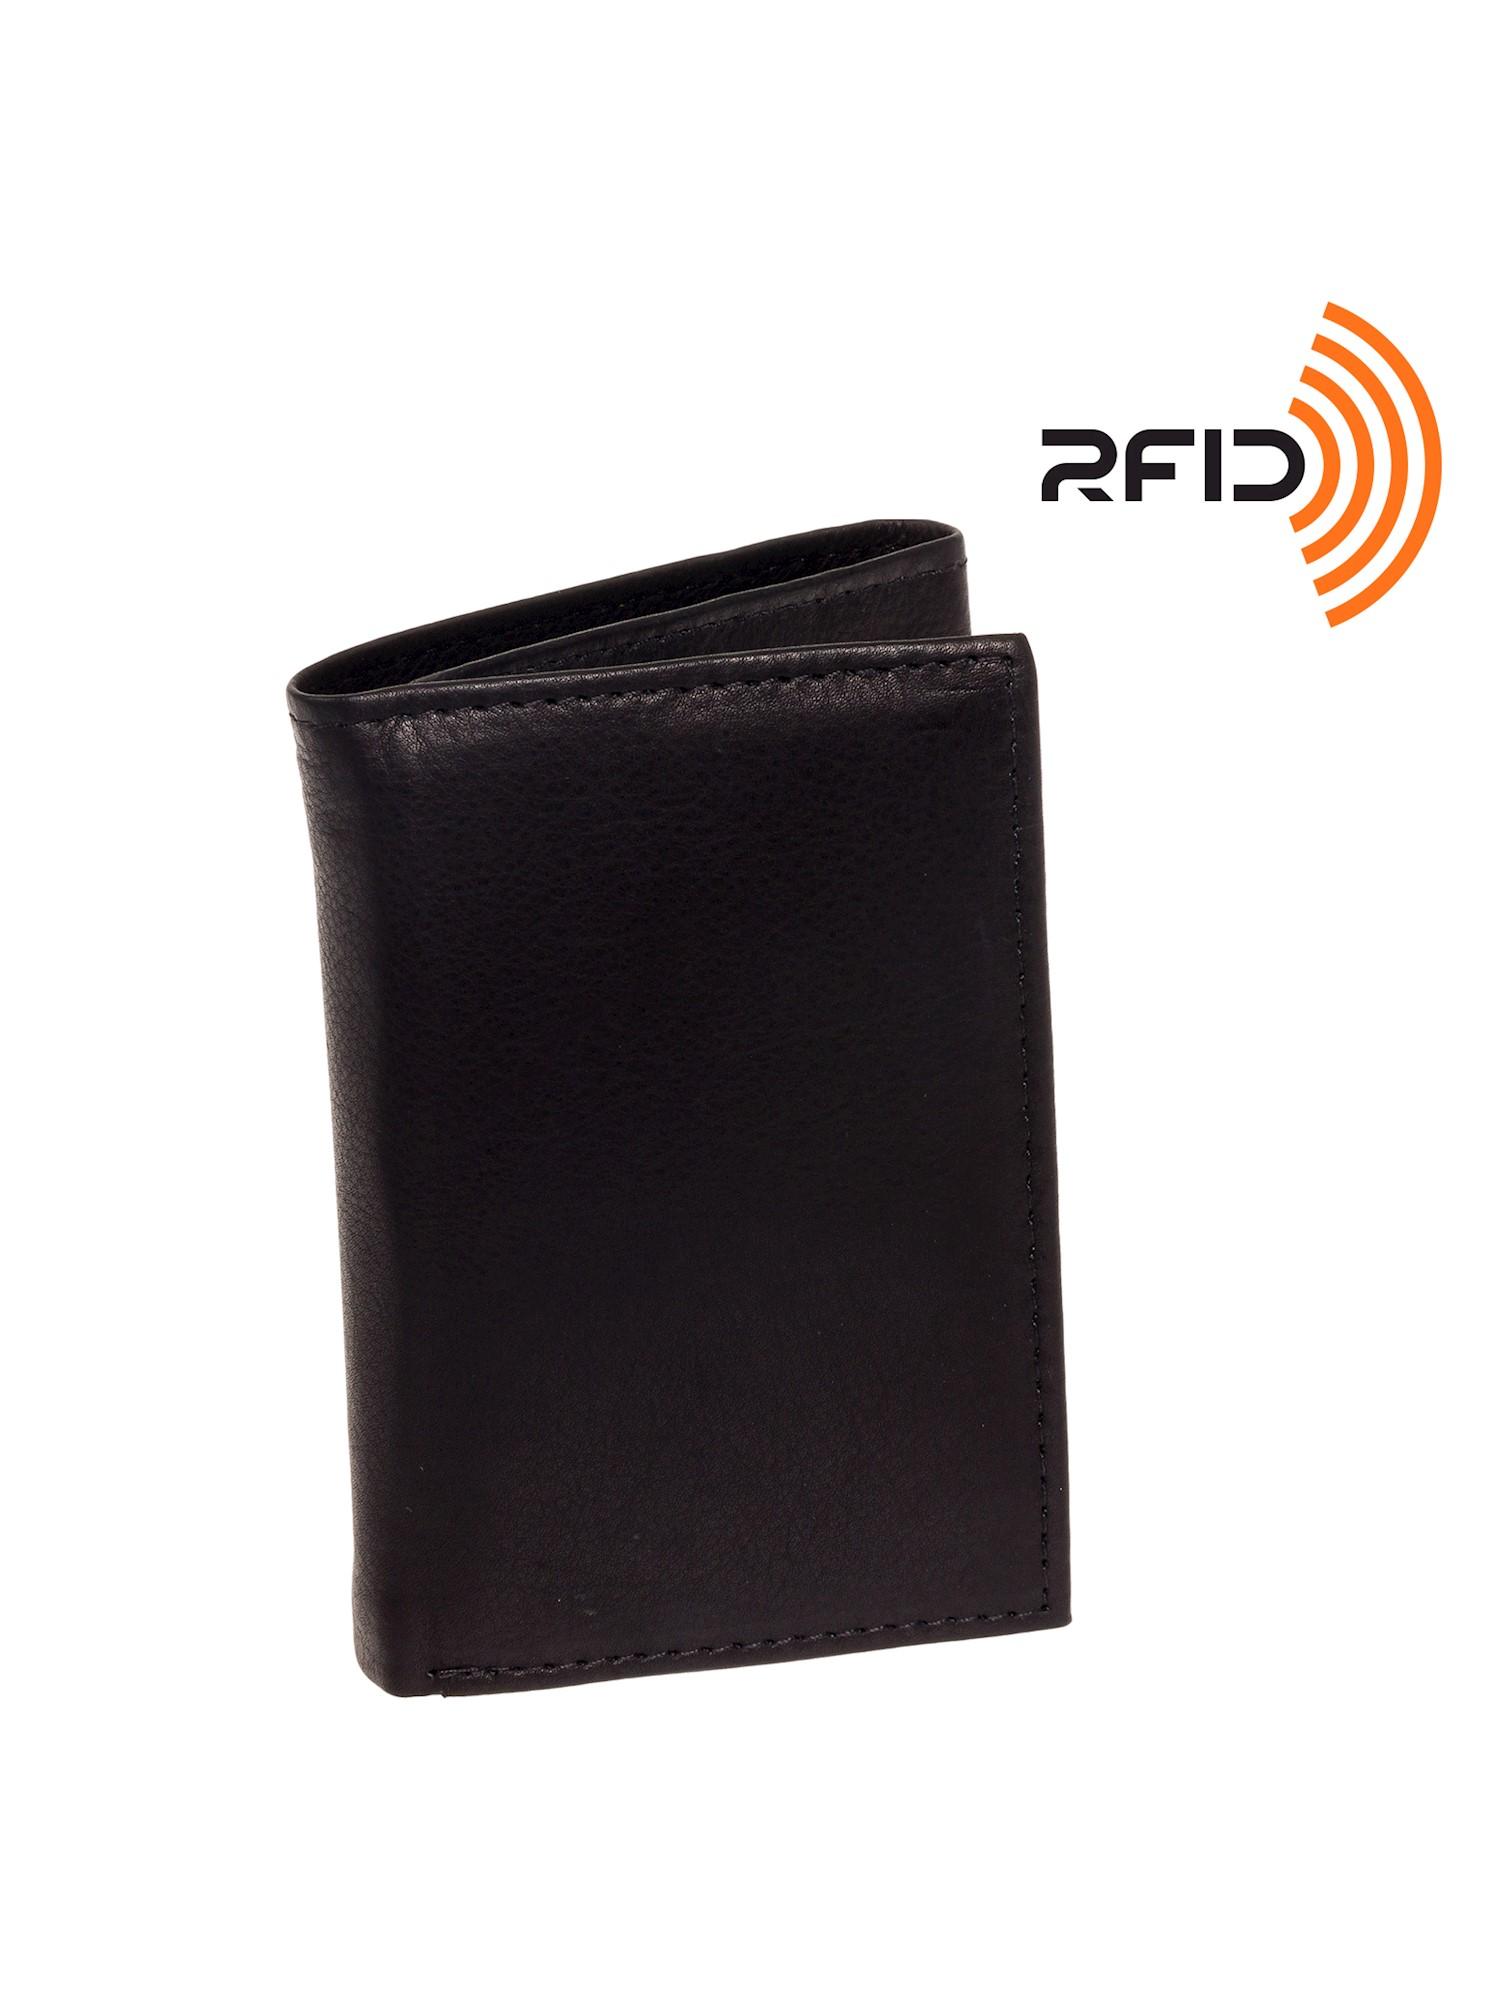 Men's Top Grain Cowhide Leather RFID Trifold Billfold Wallet